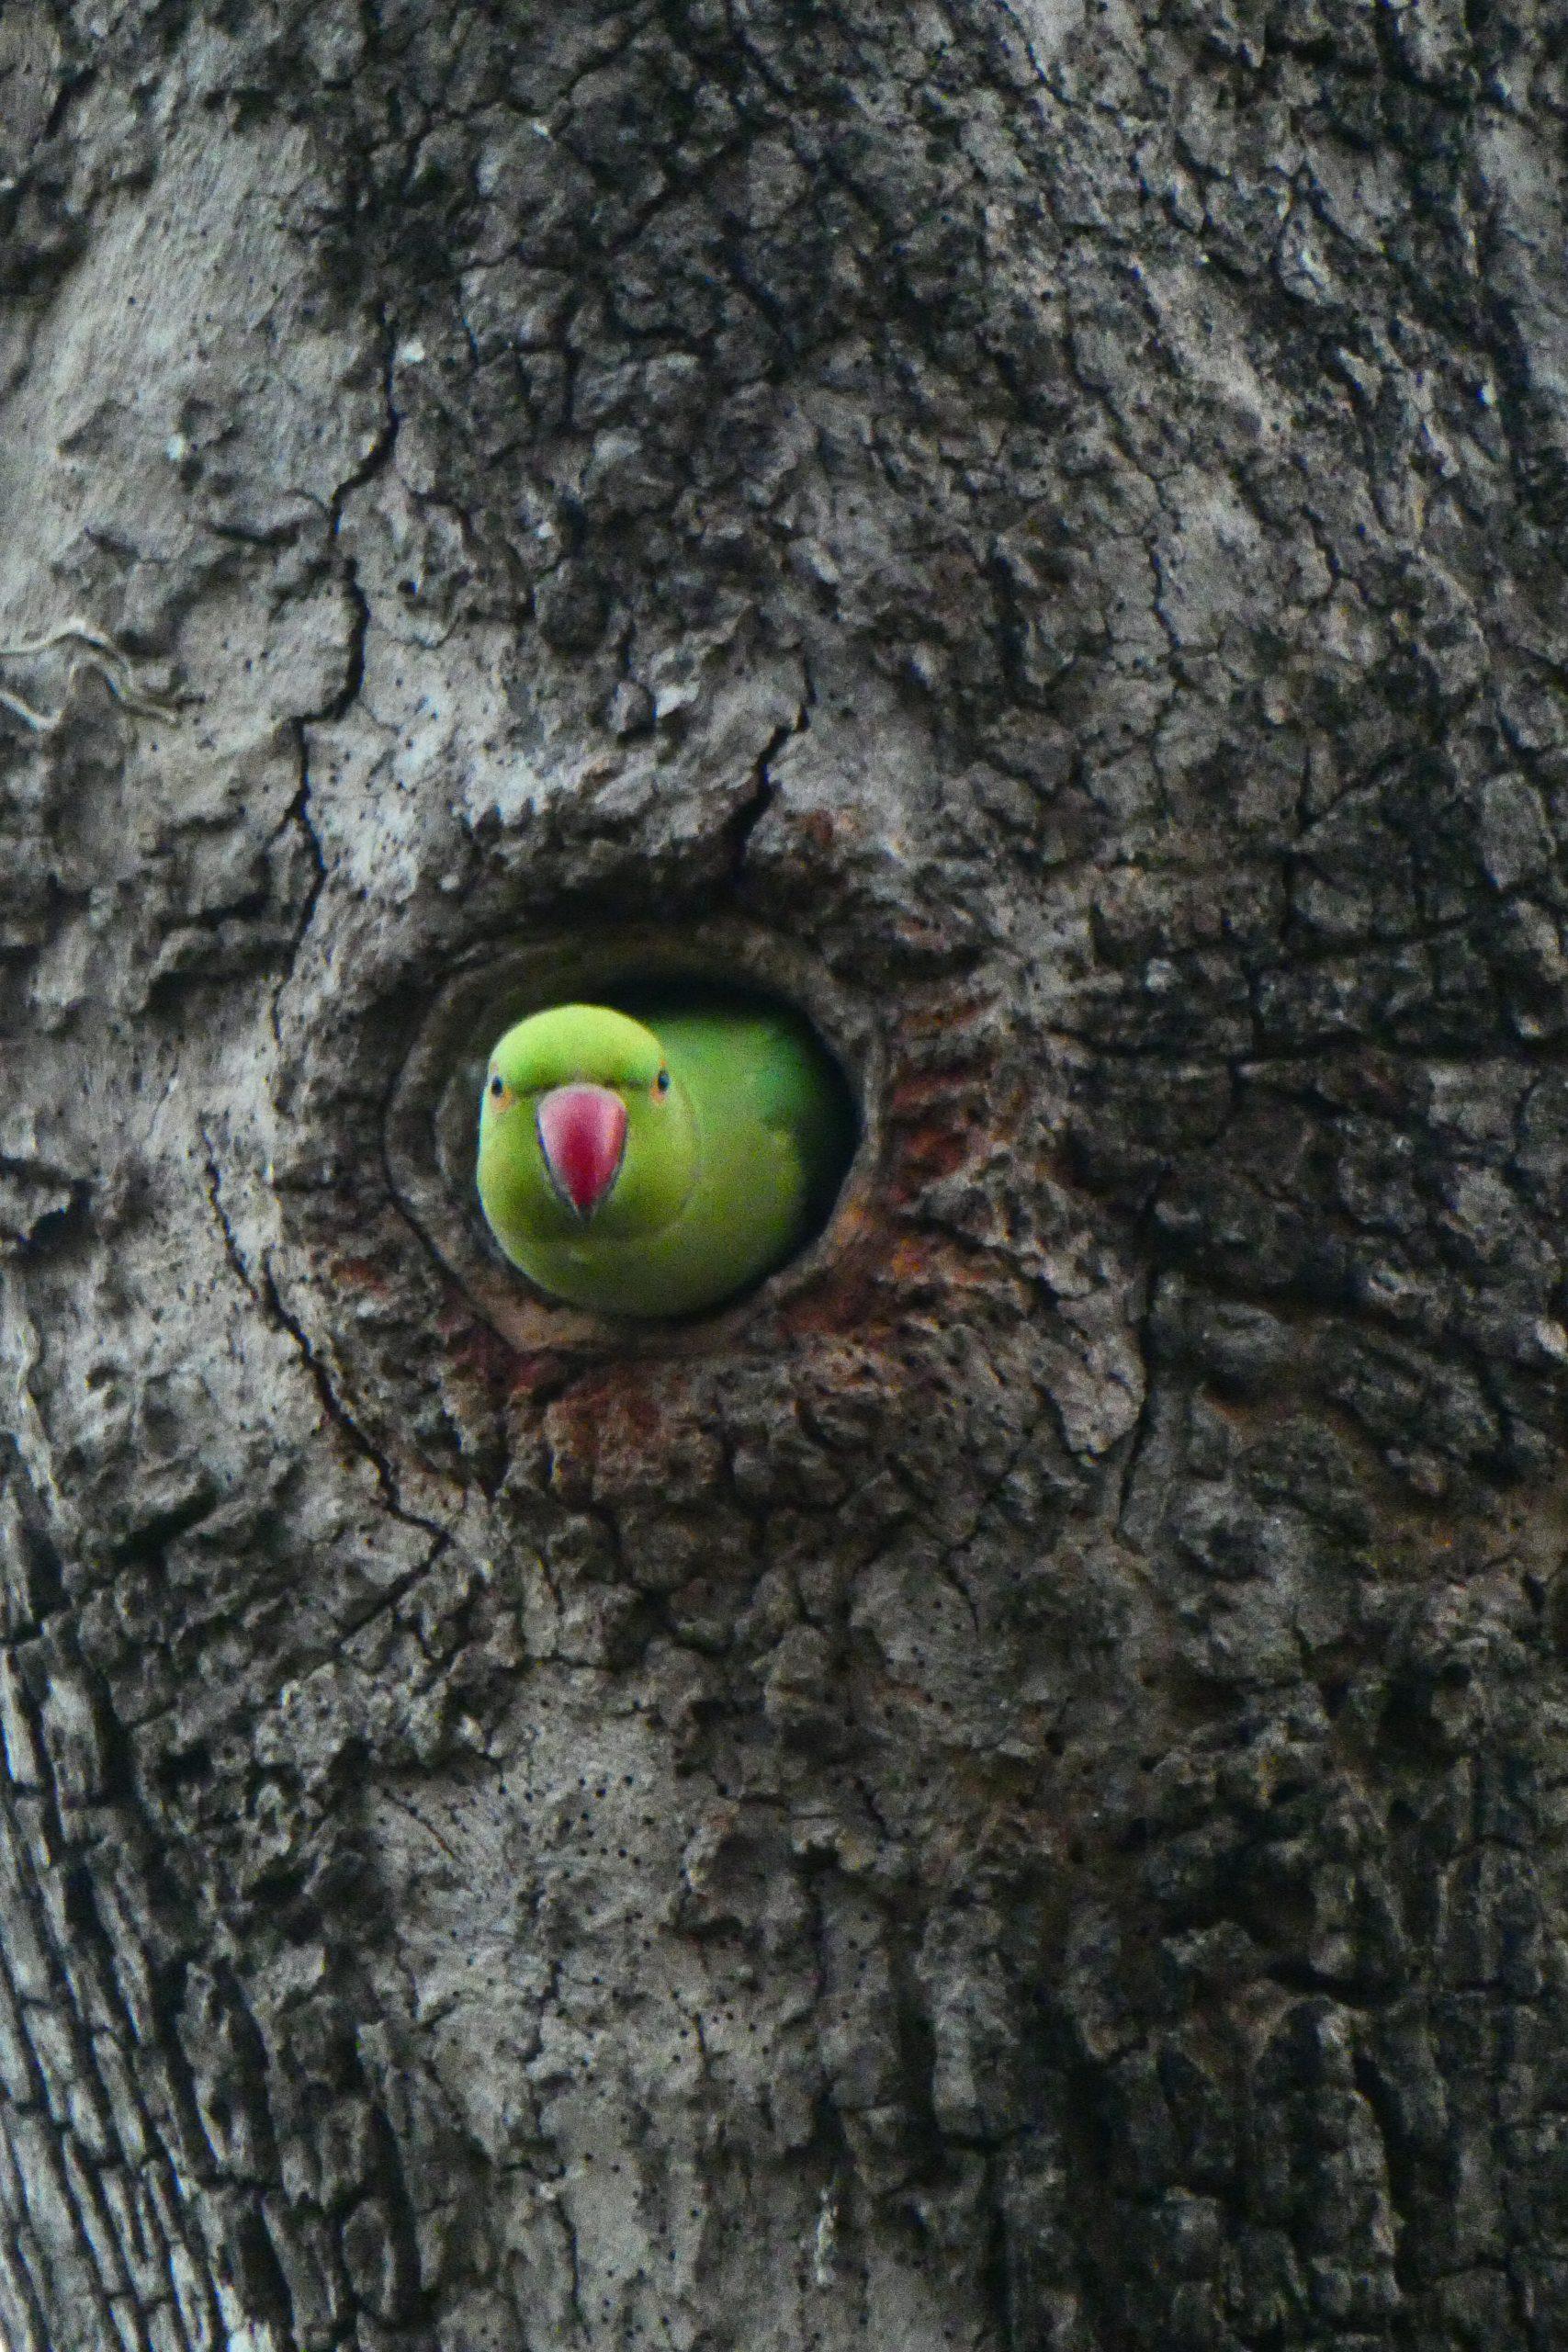 Parrot peeking through the tree